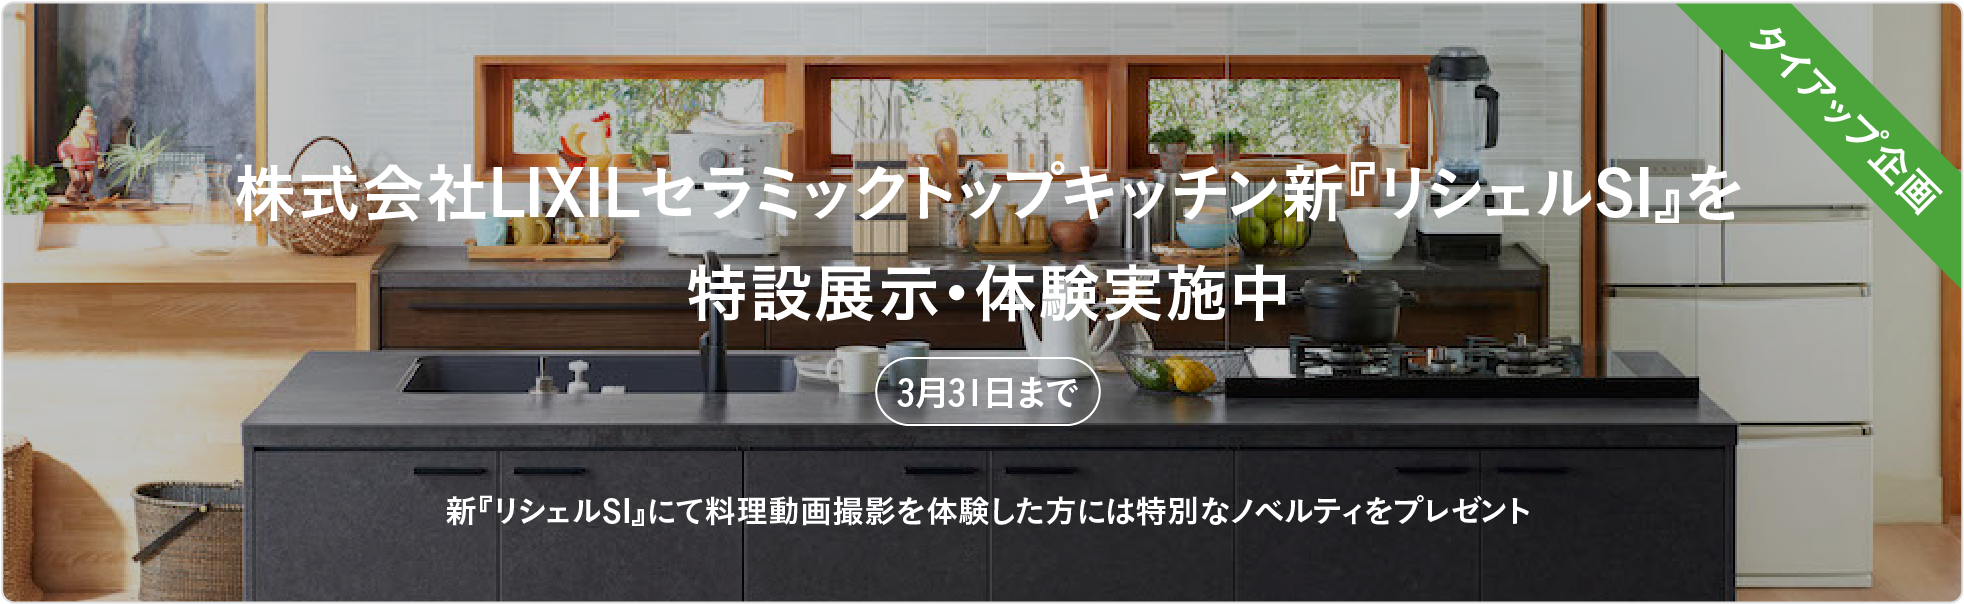 cookpad studio タイアップ企画 - LIXILセラミックトップキッチン新「リシェルSI」を特設展示・体験実施中